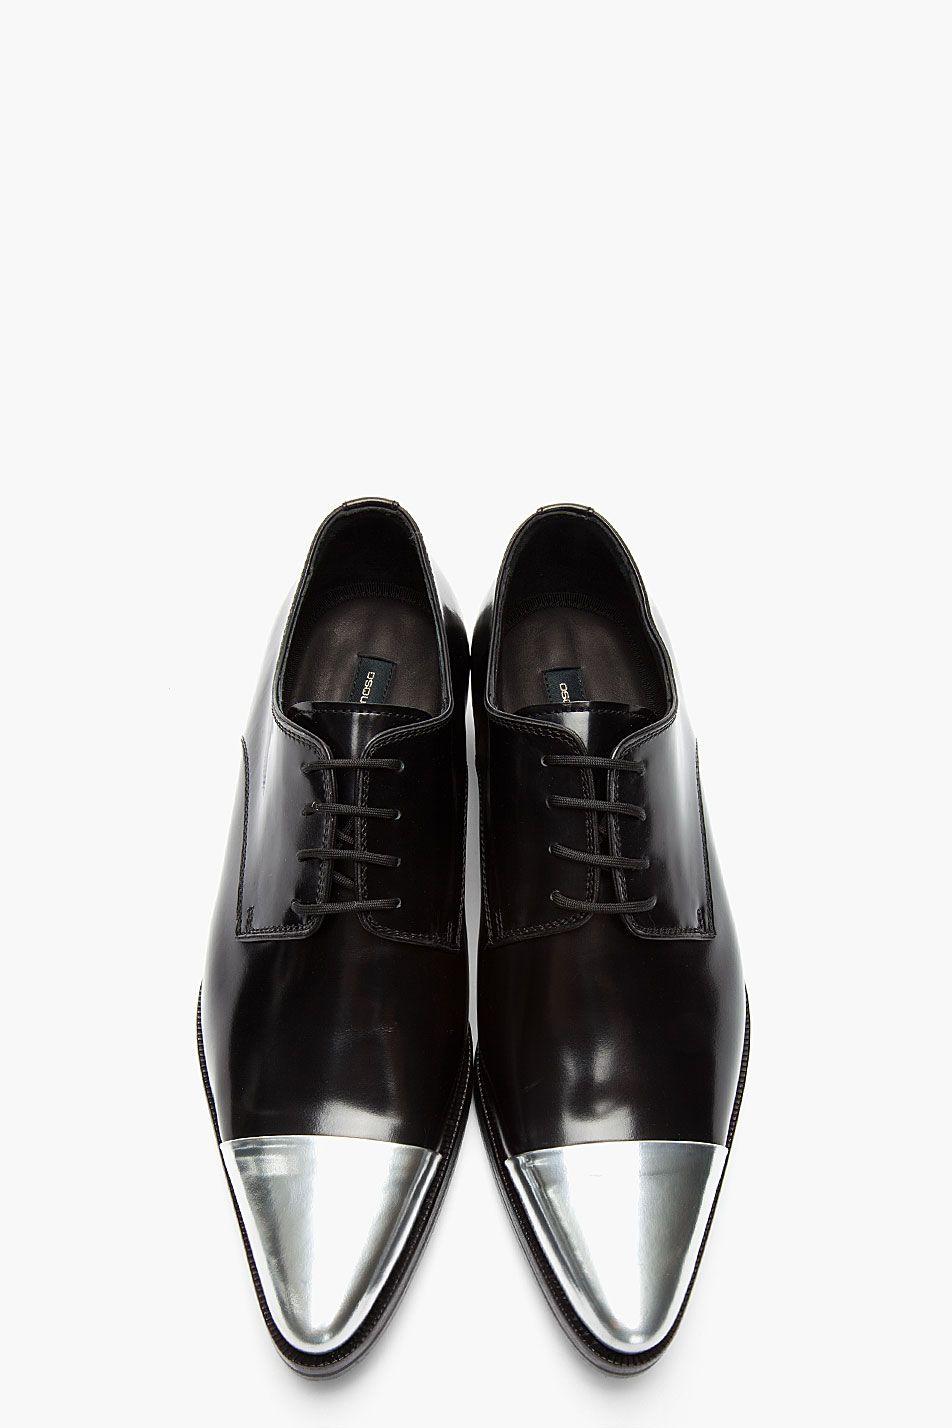 eda717b519bdb Black Silver Cap Toe Derby Leather Dress Shoe! Black is the color ...